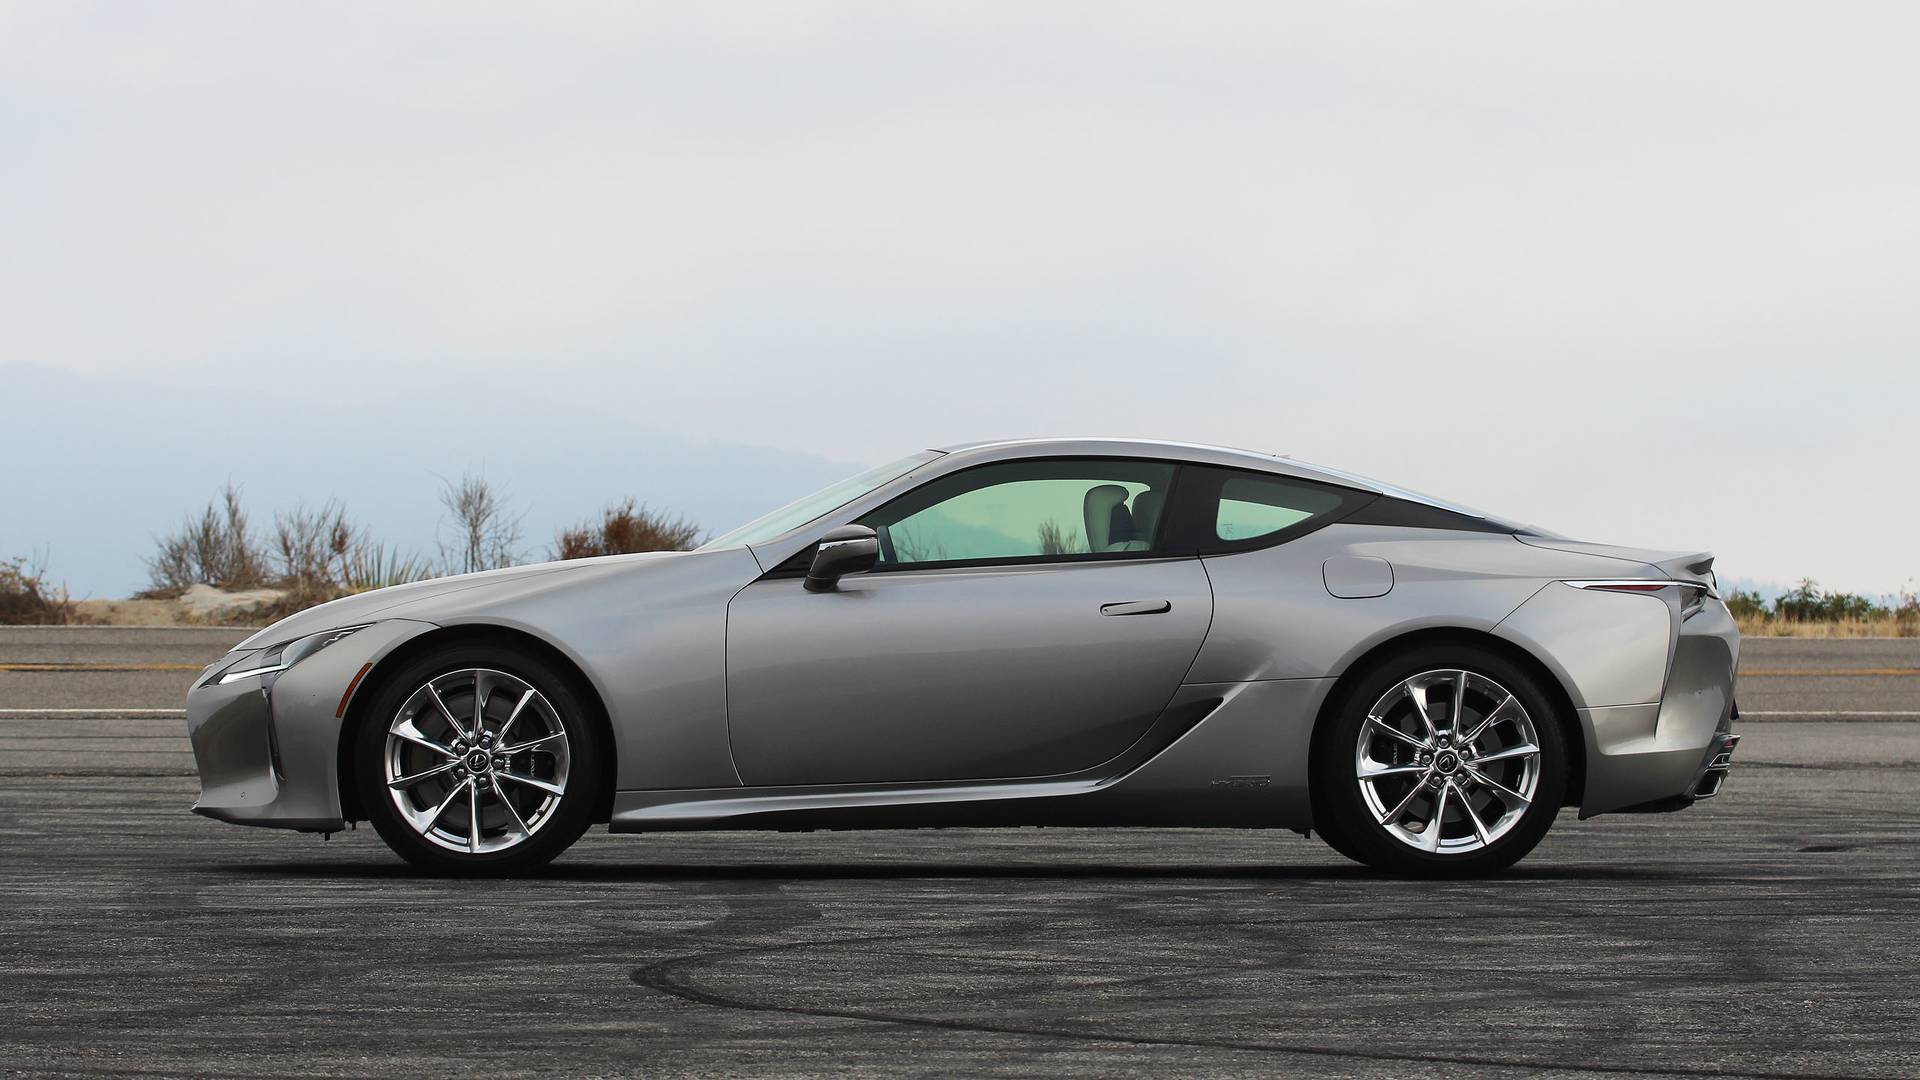 Https://www.motor1.com/reviews/18551... Hybrid Coupe/